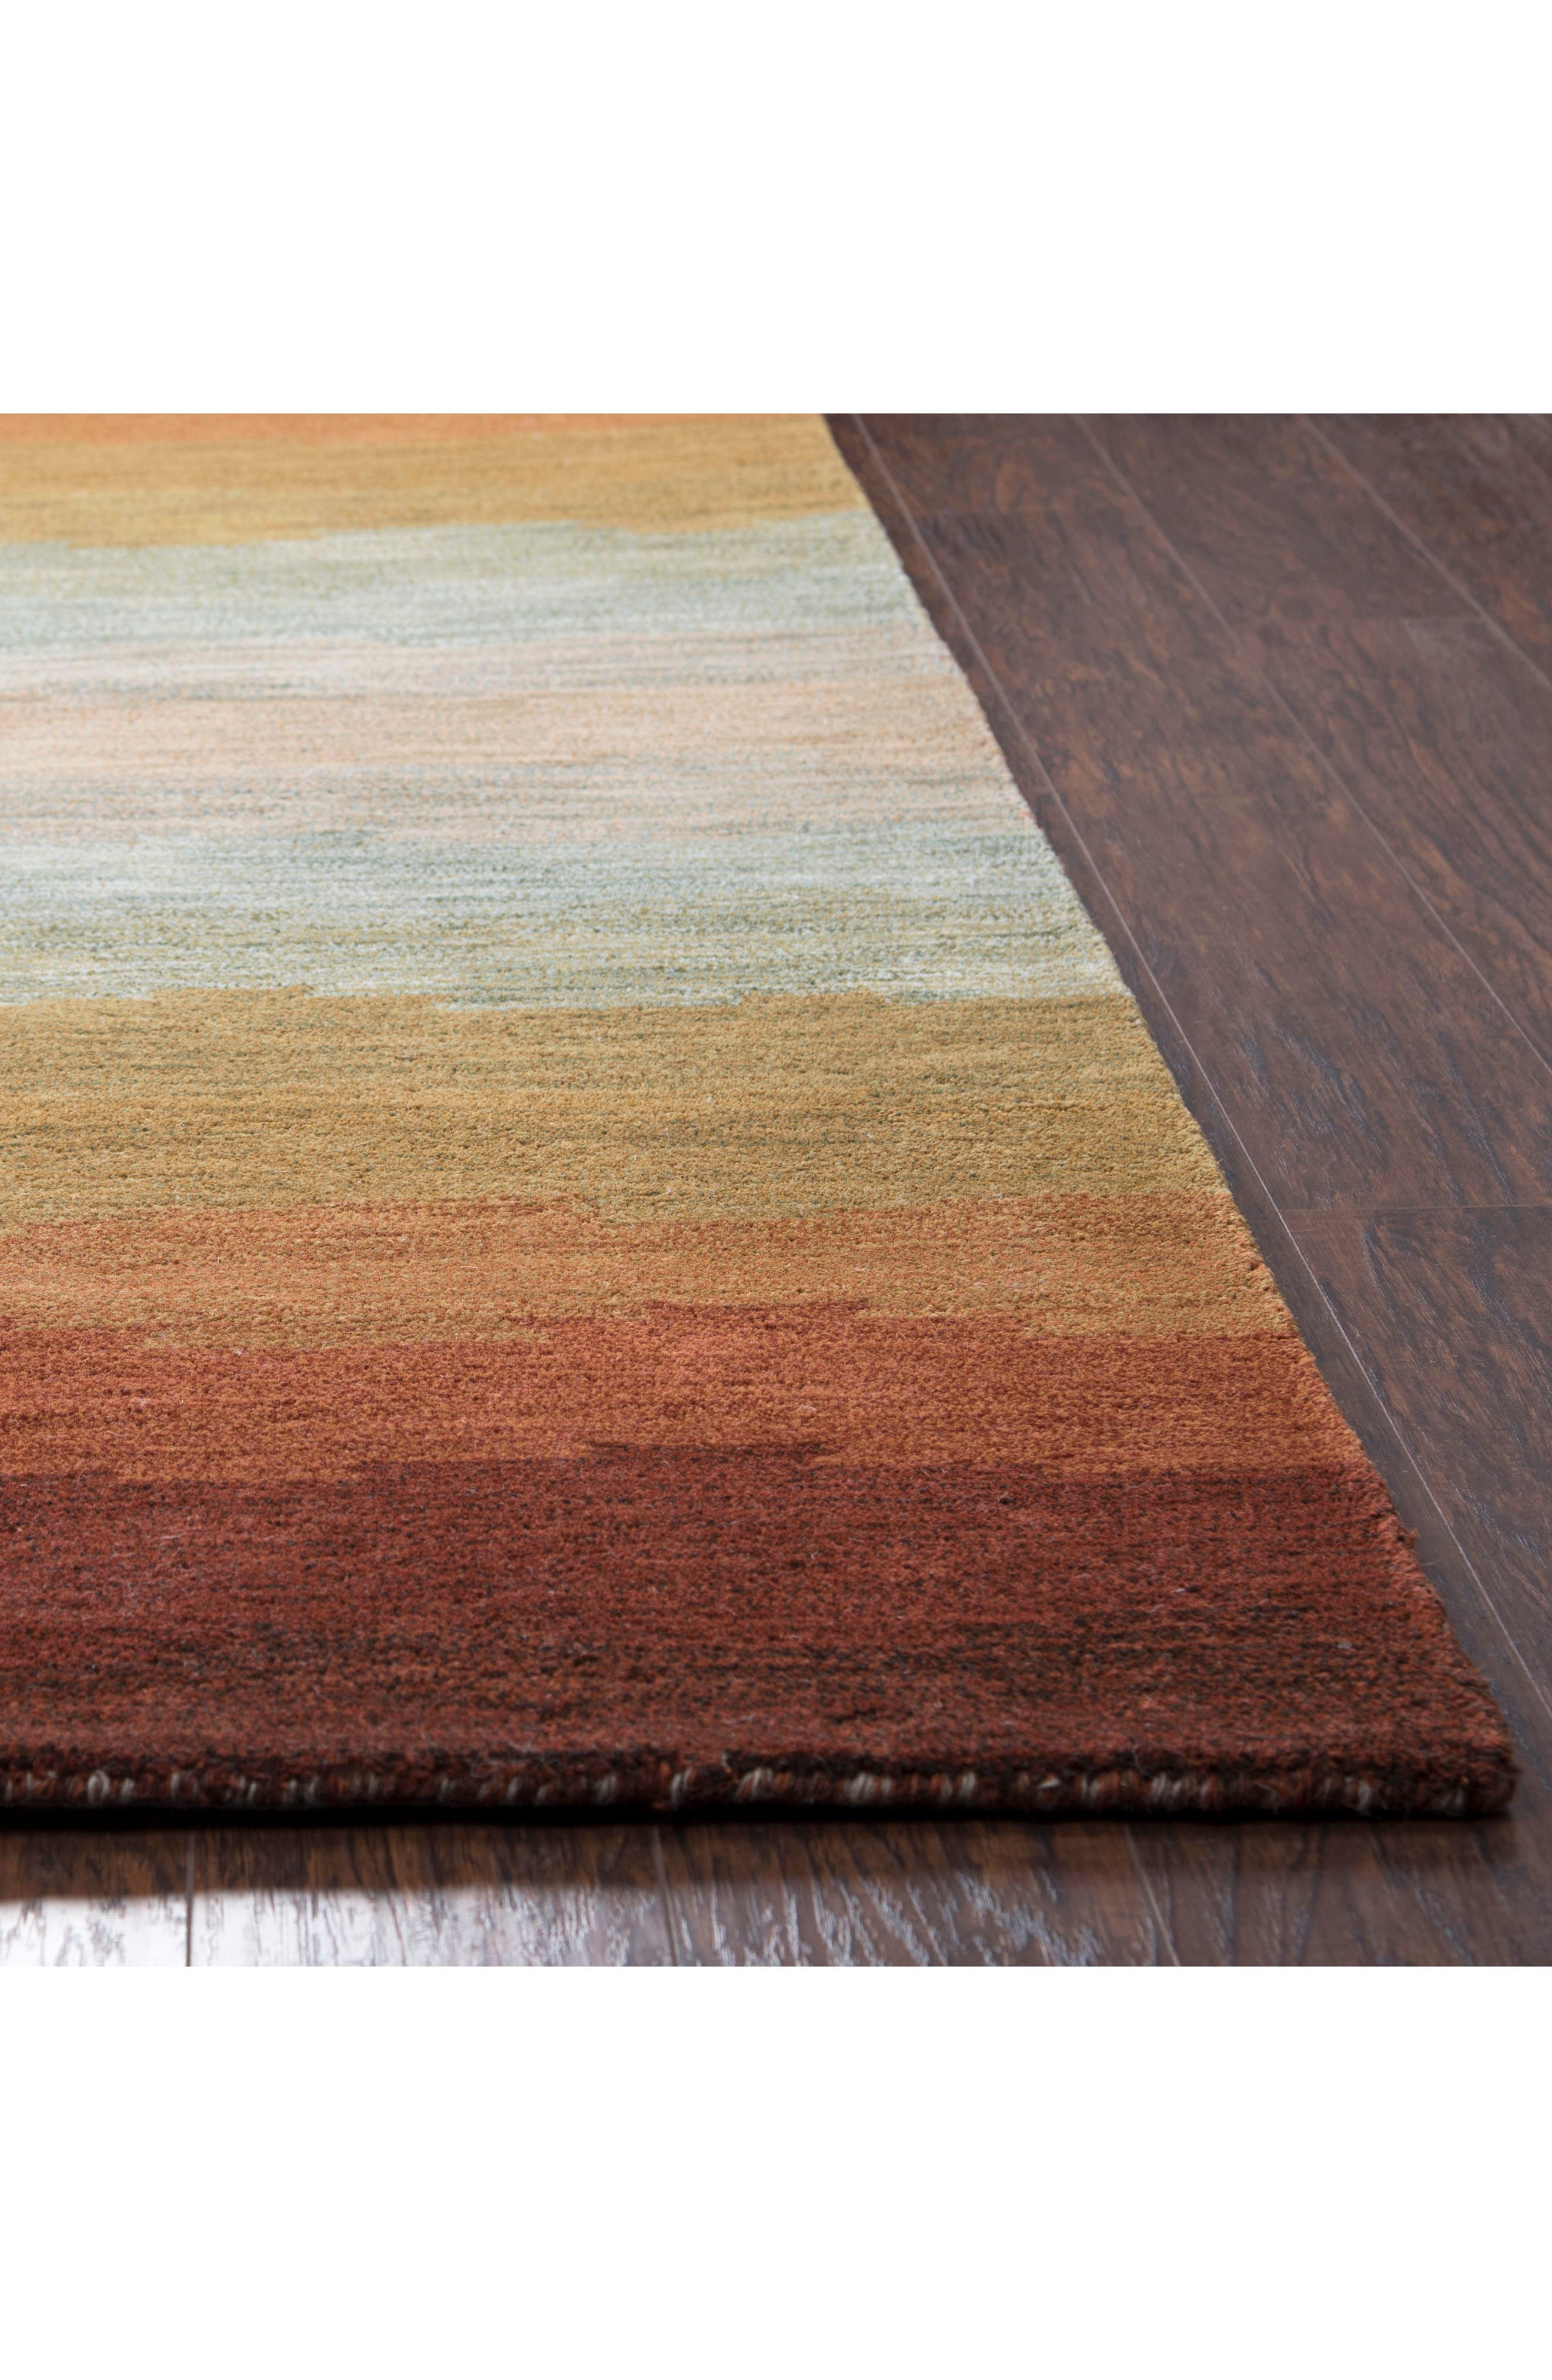 Desert Oasis Hand Tufted Wool Area Rug,                             Alternate thumbnail 3, color,                             Rust